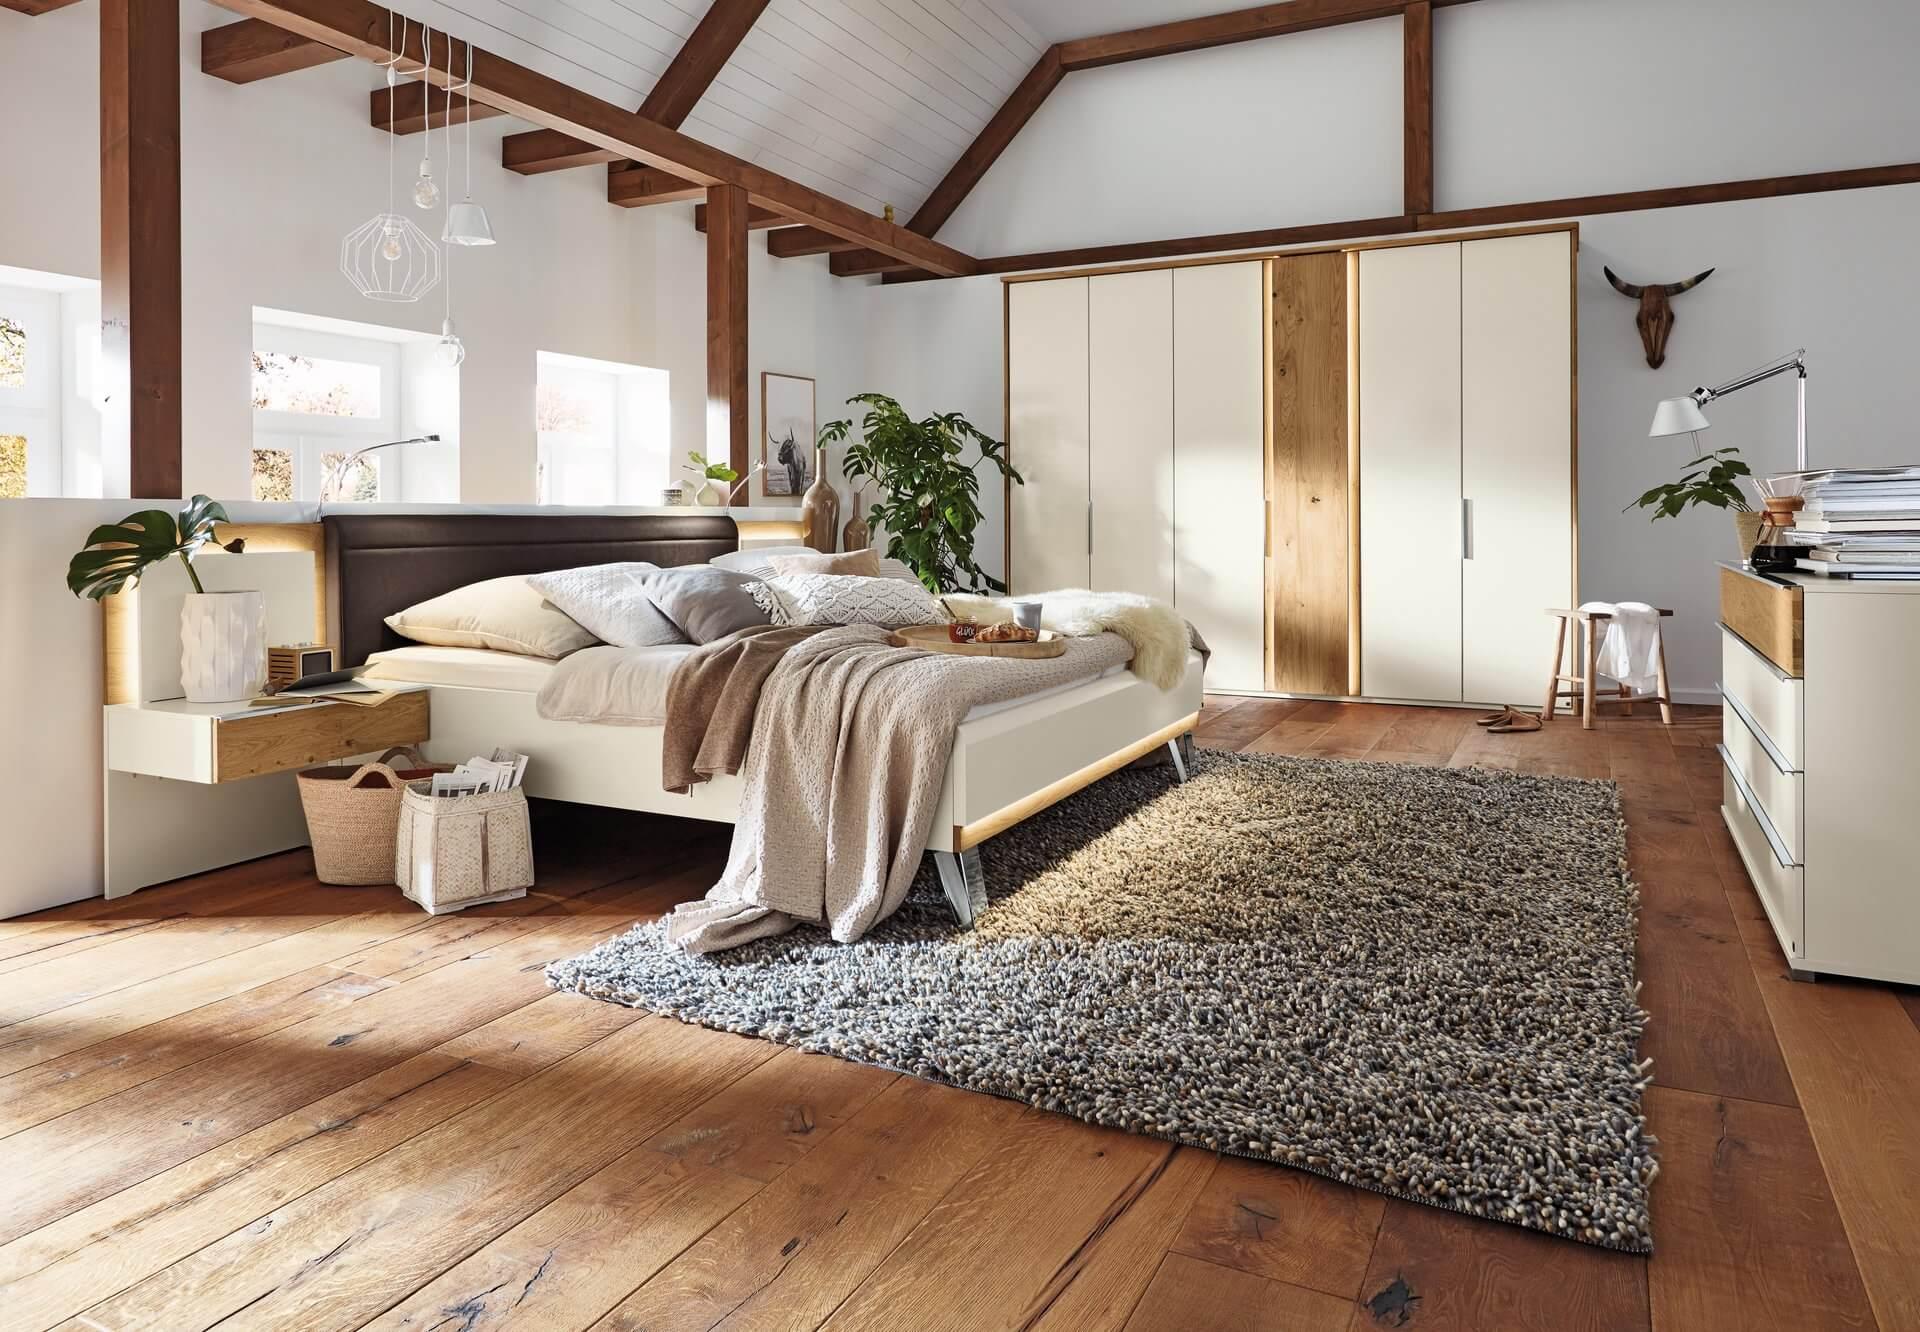 Full Size of Musterring Saphira Schrank Bett 200x200 Schlafzimmer Kommode Kieselgrau Kleiderschrank Esstisch Betten Wohnzimmer Musterring Saphira